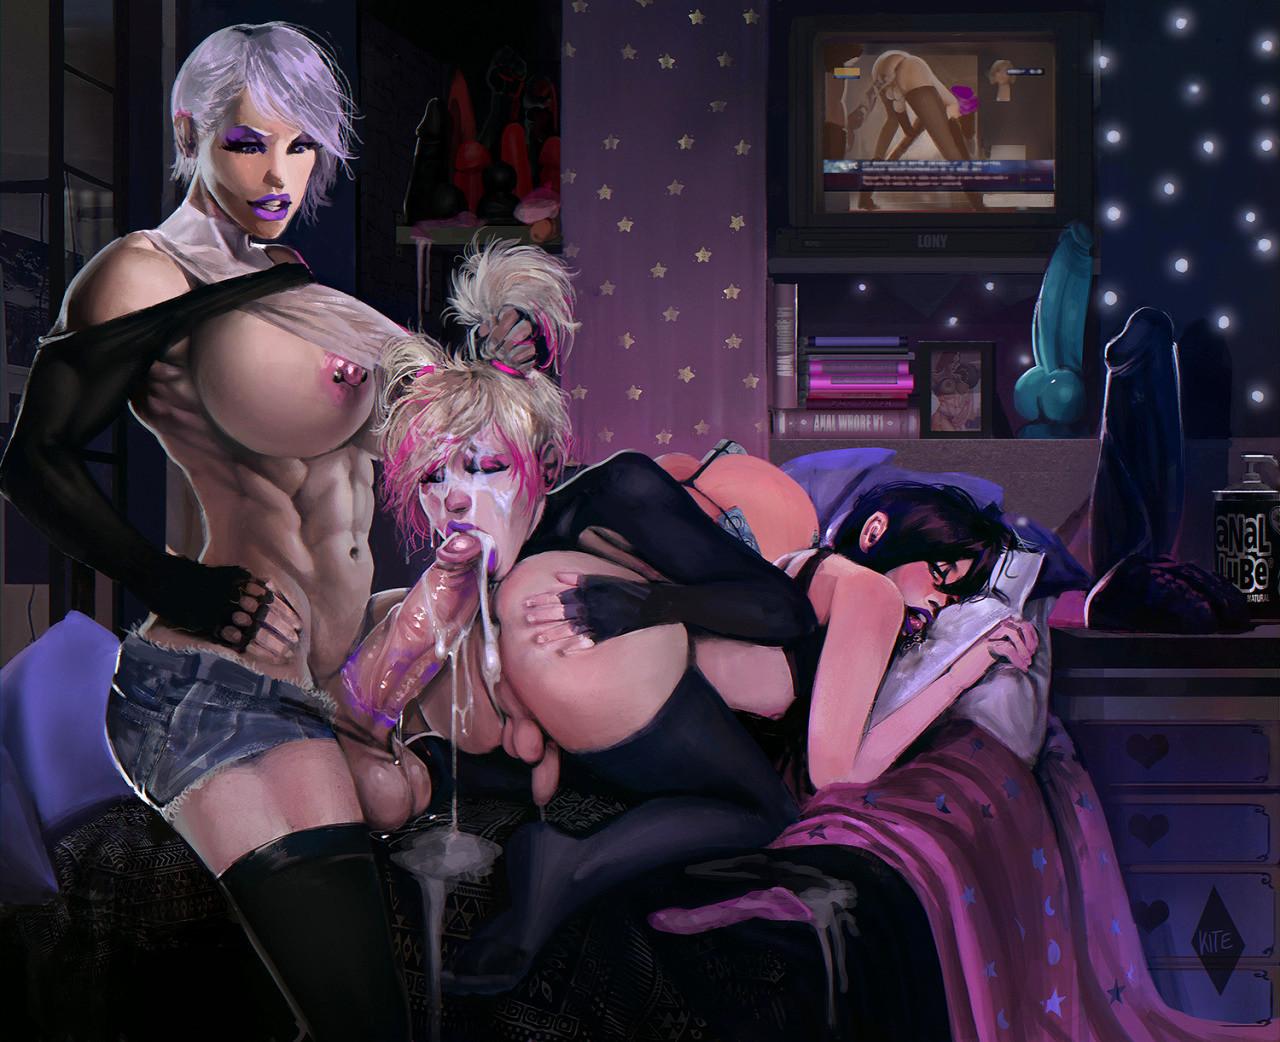 Hardcore Hentai Shemale Orgy